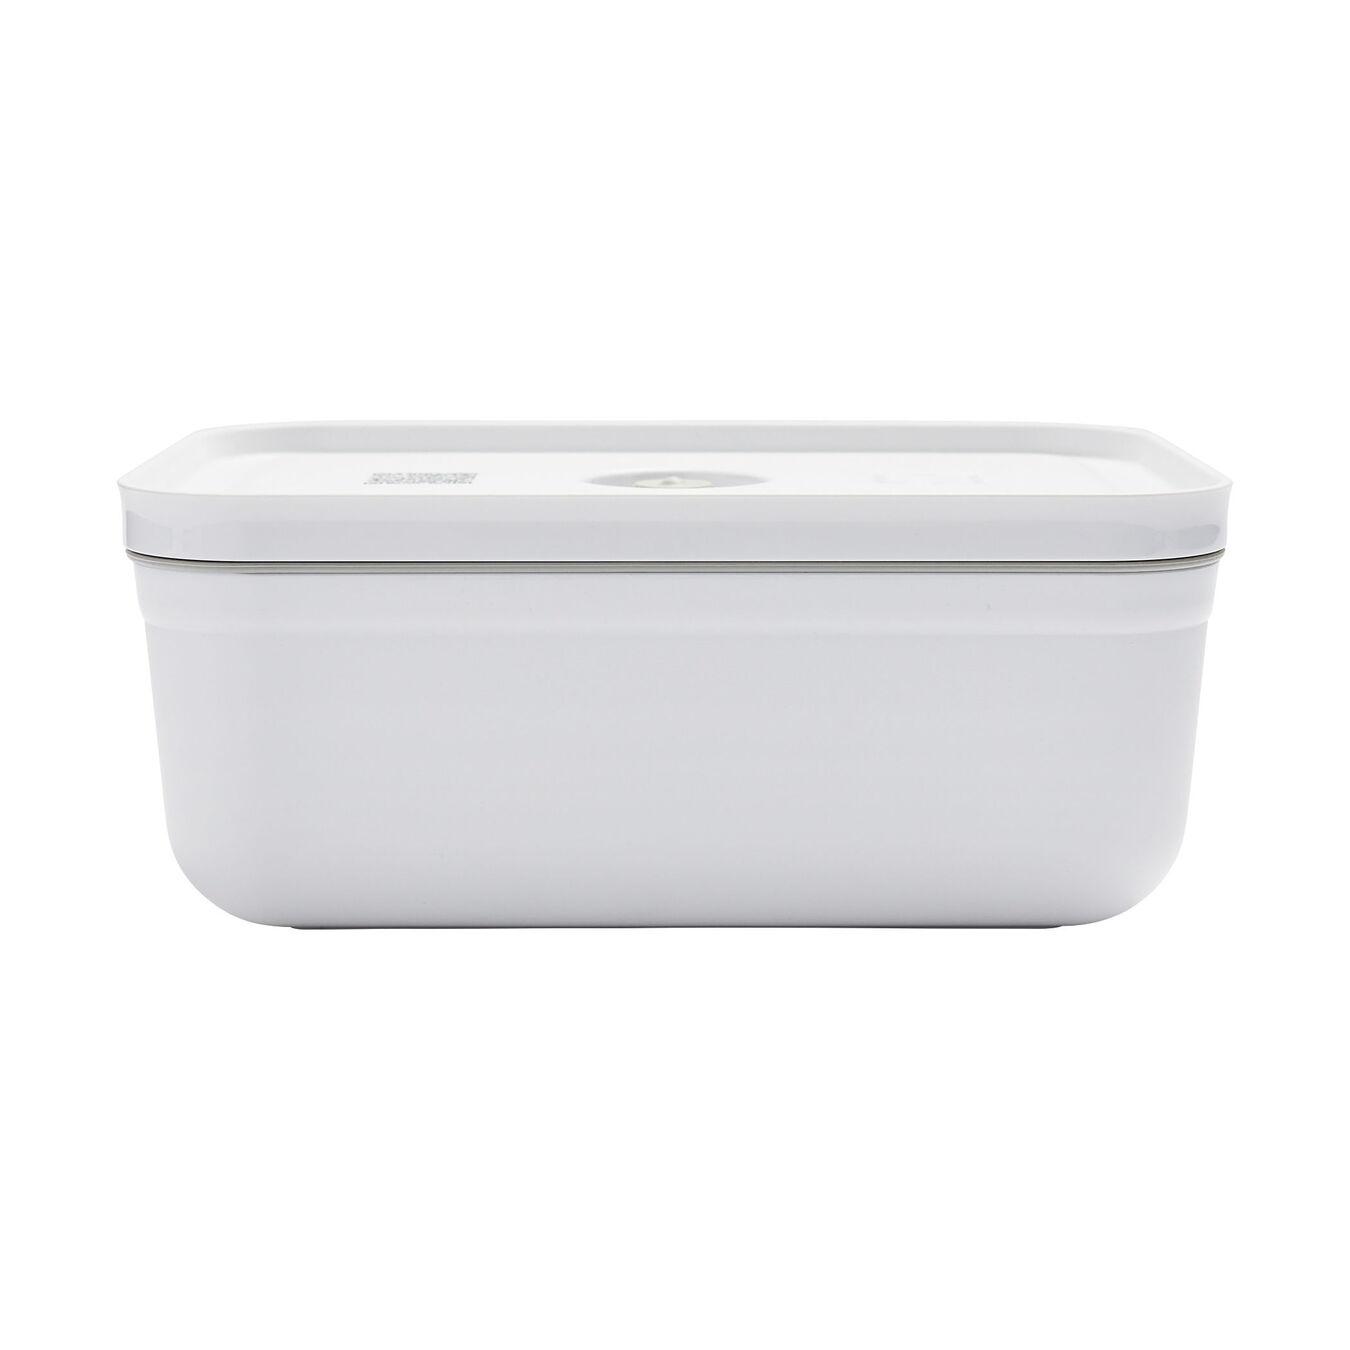 large Vacuum lunch box, Plastic, white,,large 3